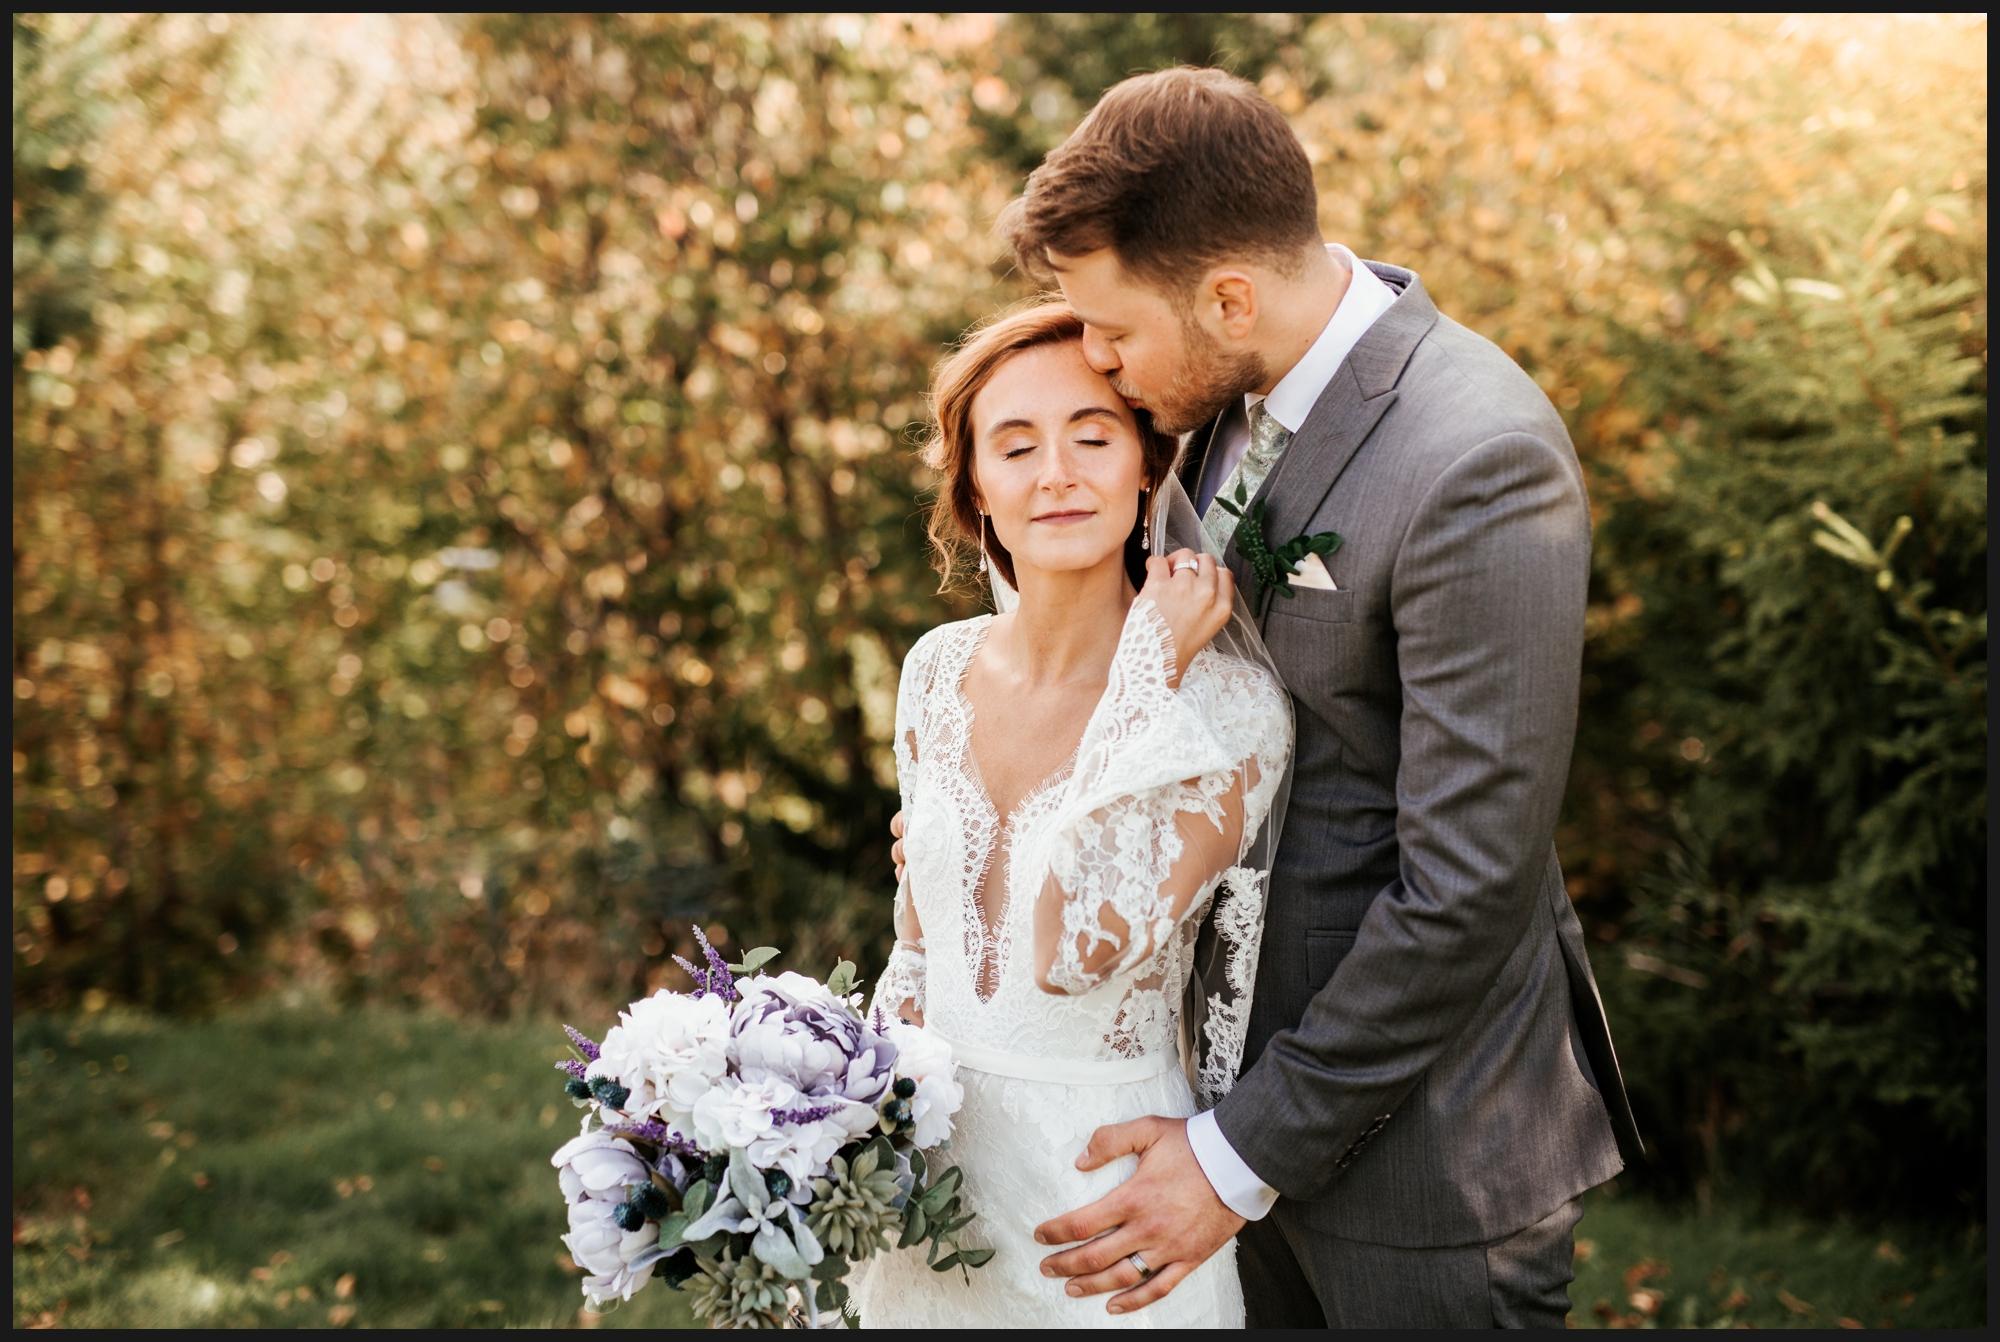 Orlando-Wedding-Photographer-destination-wedding-photographer-florida-wedding-photographer-hawaii-wedding-photographer_0155.jpg